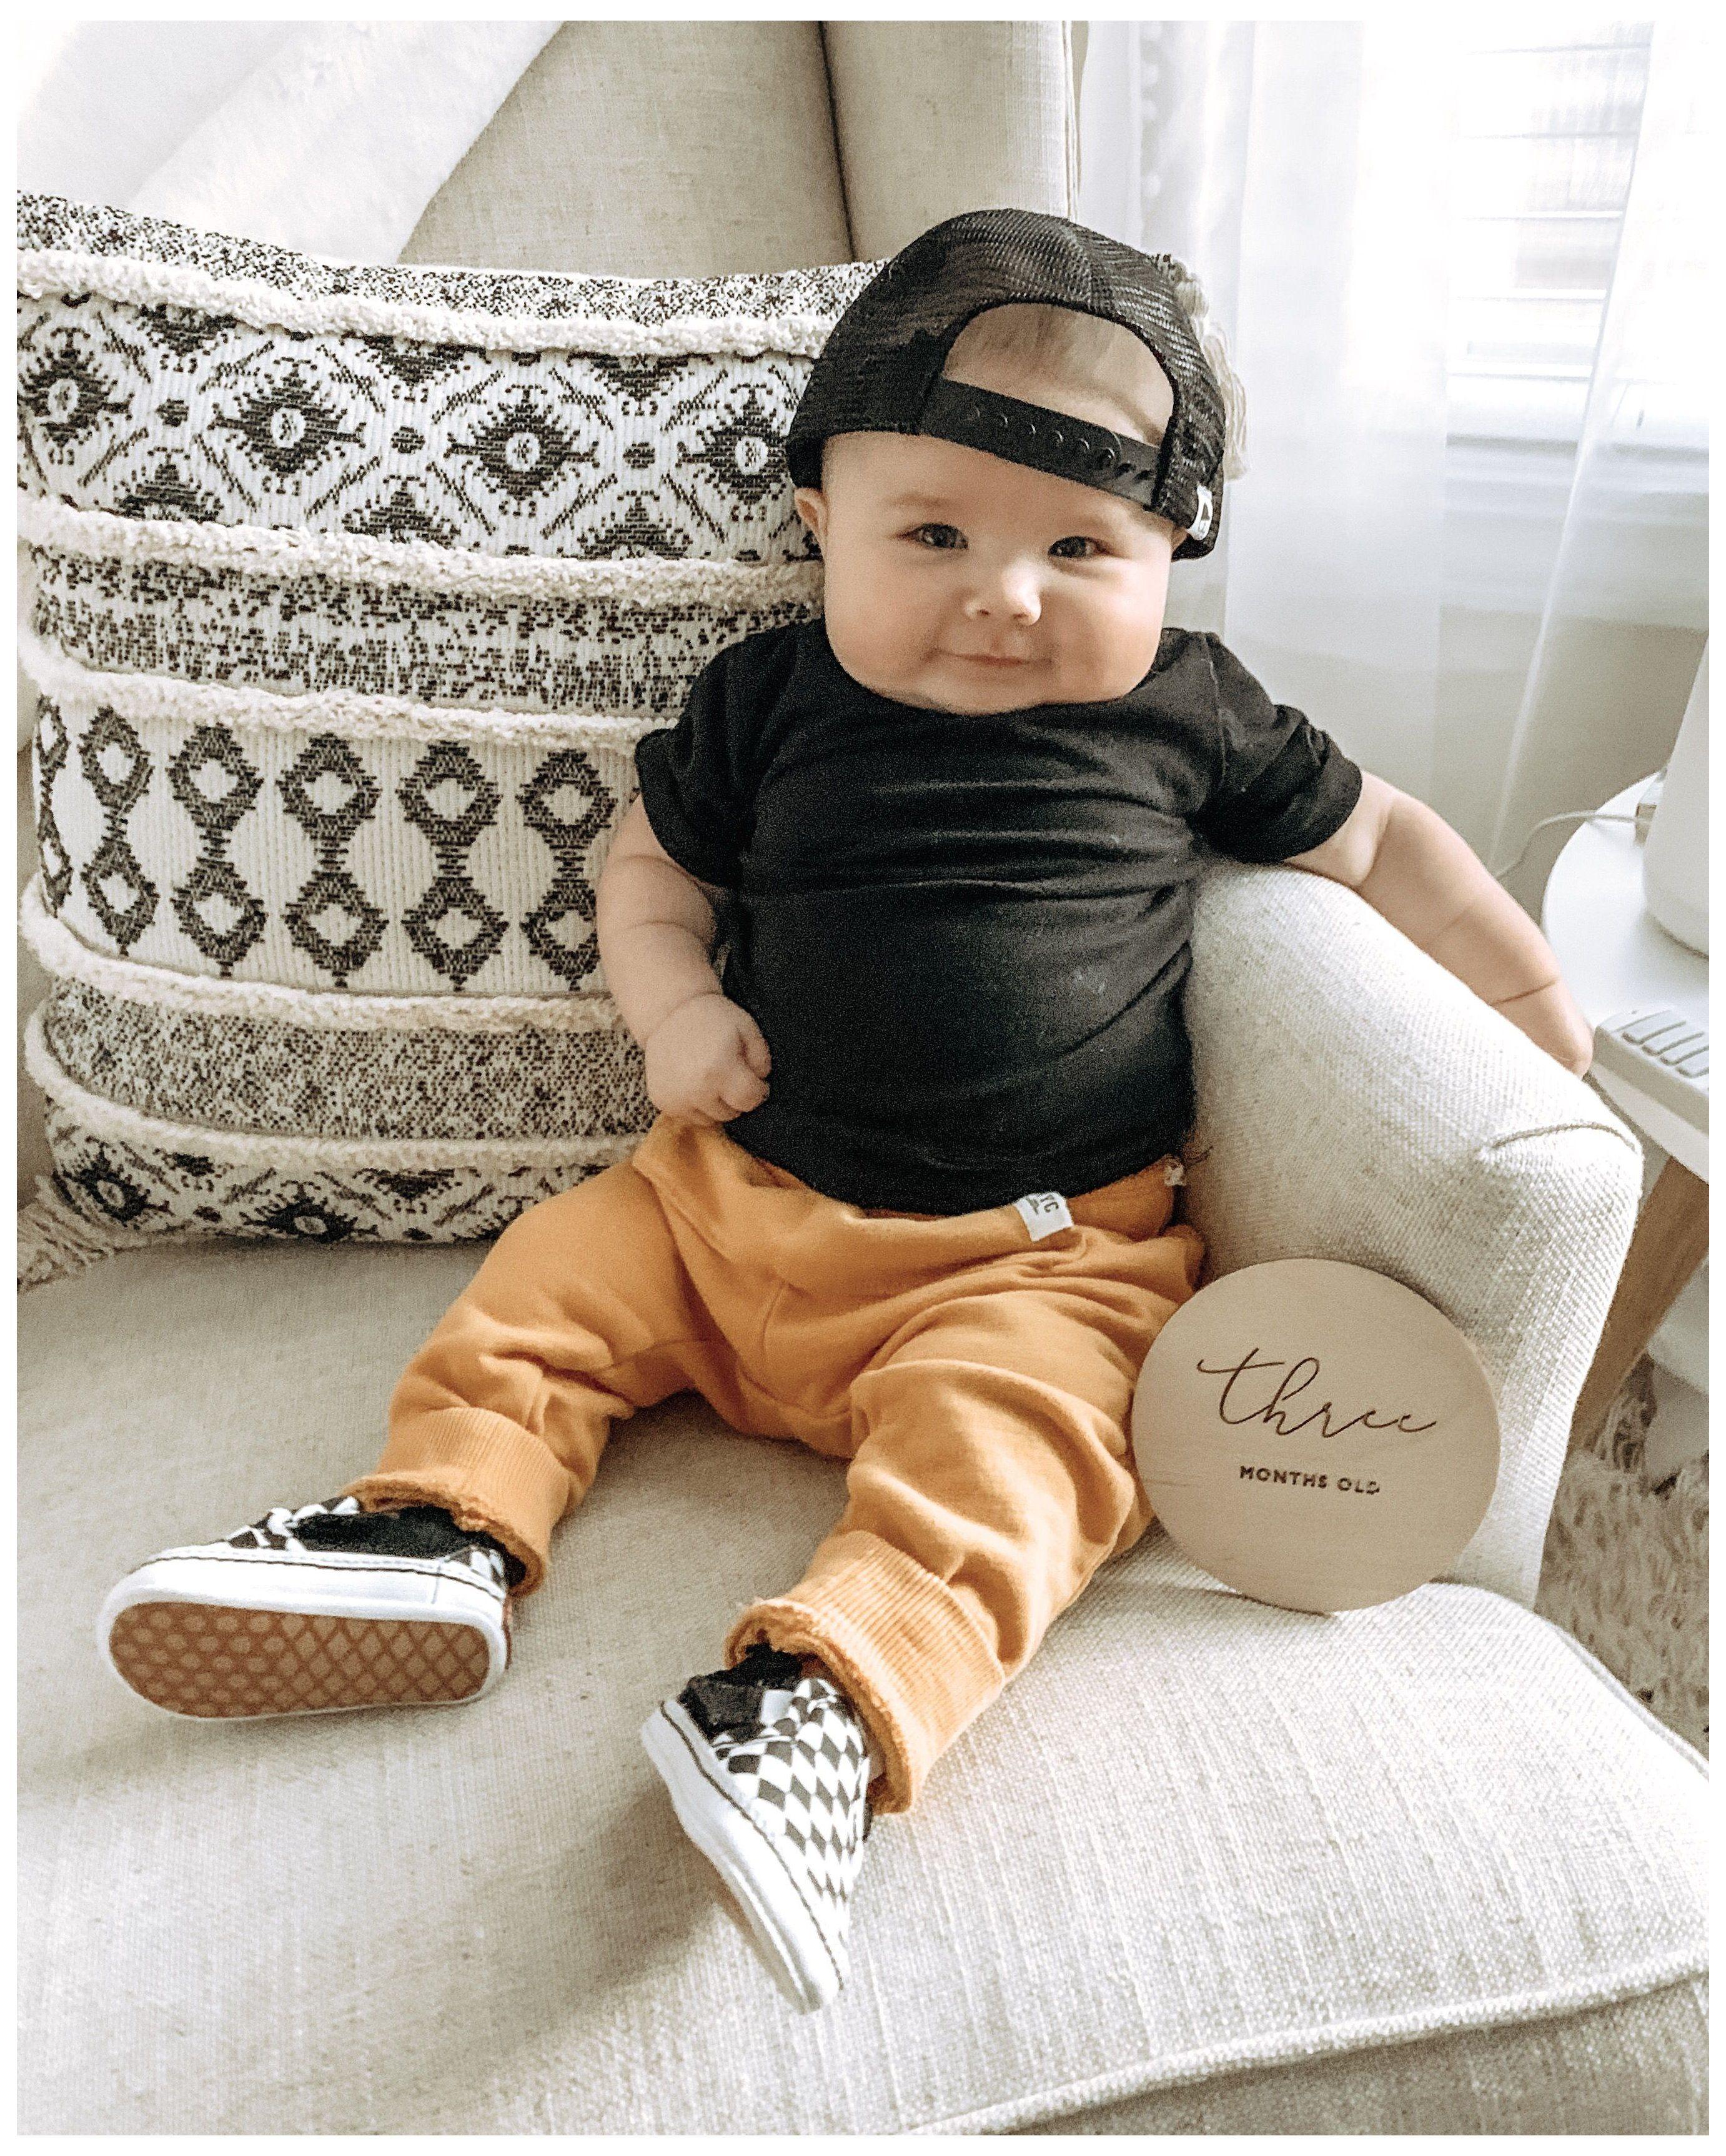 Baby boy clothes #little #baby #boy #outfits #littlebabyboyoutfits